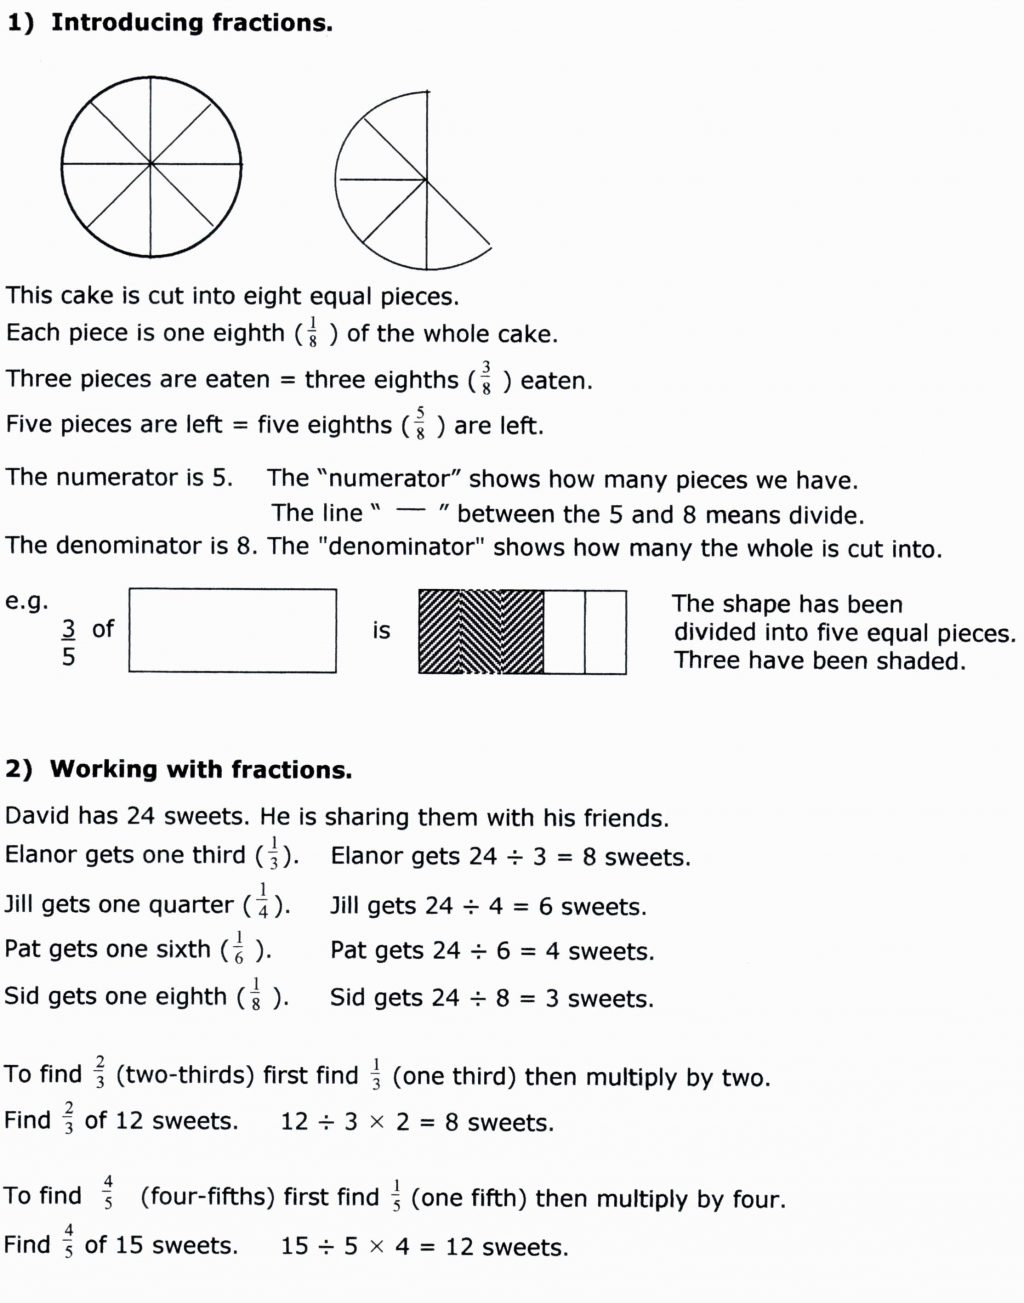 Fractions Worksheets 7Th Grade Math Printable Worksheet ...